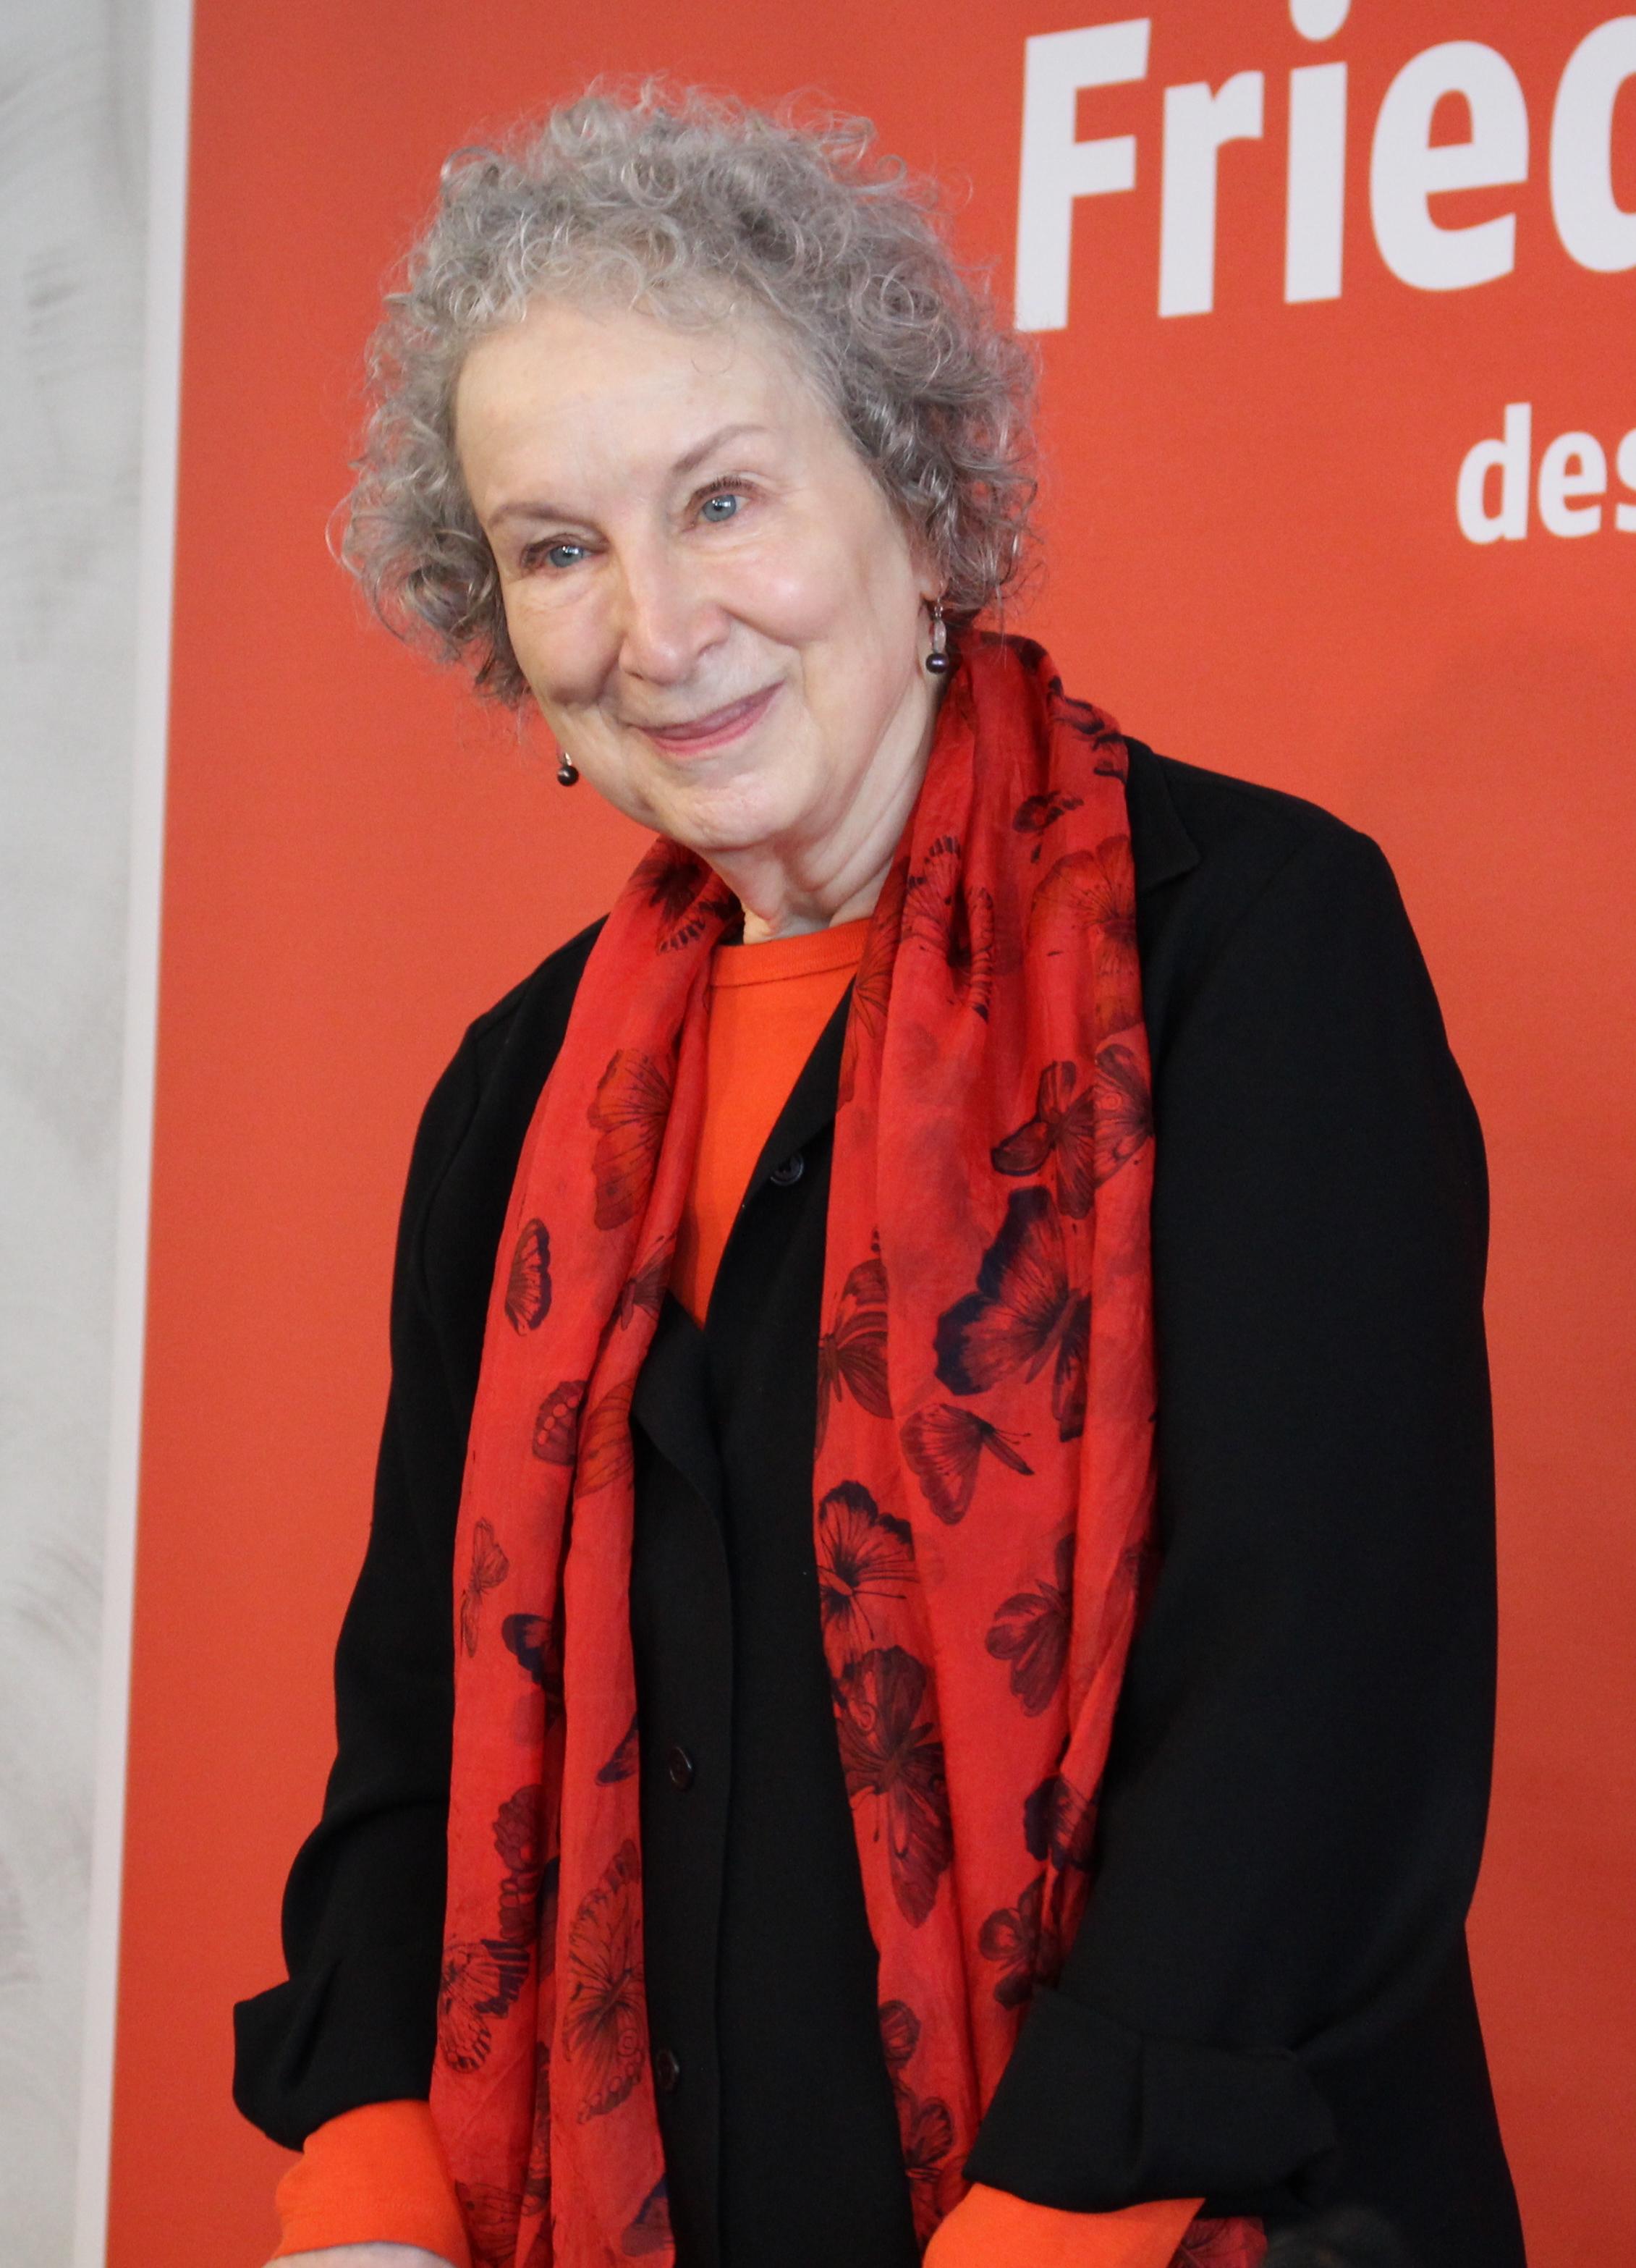 Atwood at the 2017 [[Frankfurt Book Fair]]